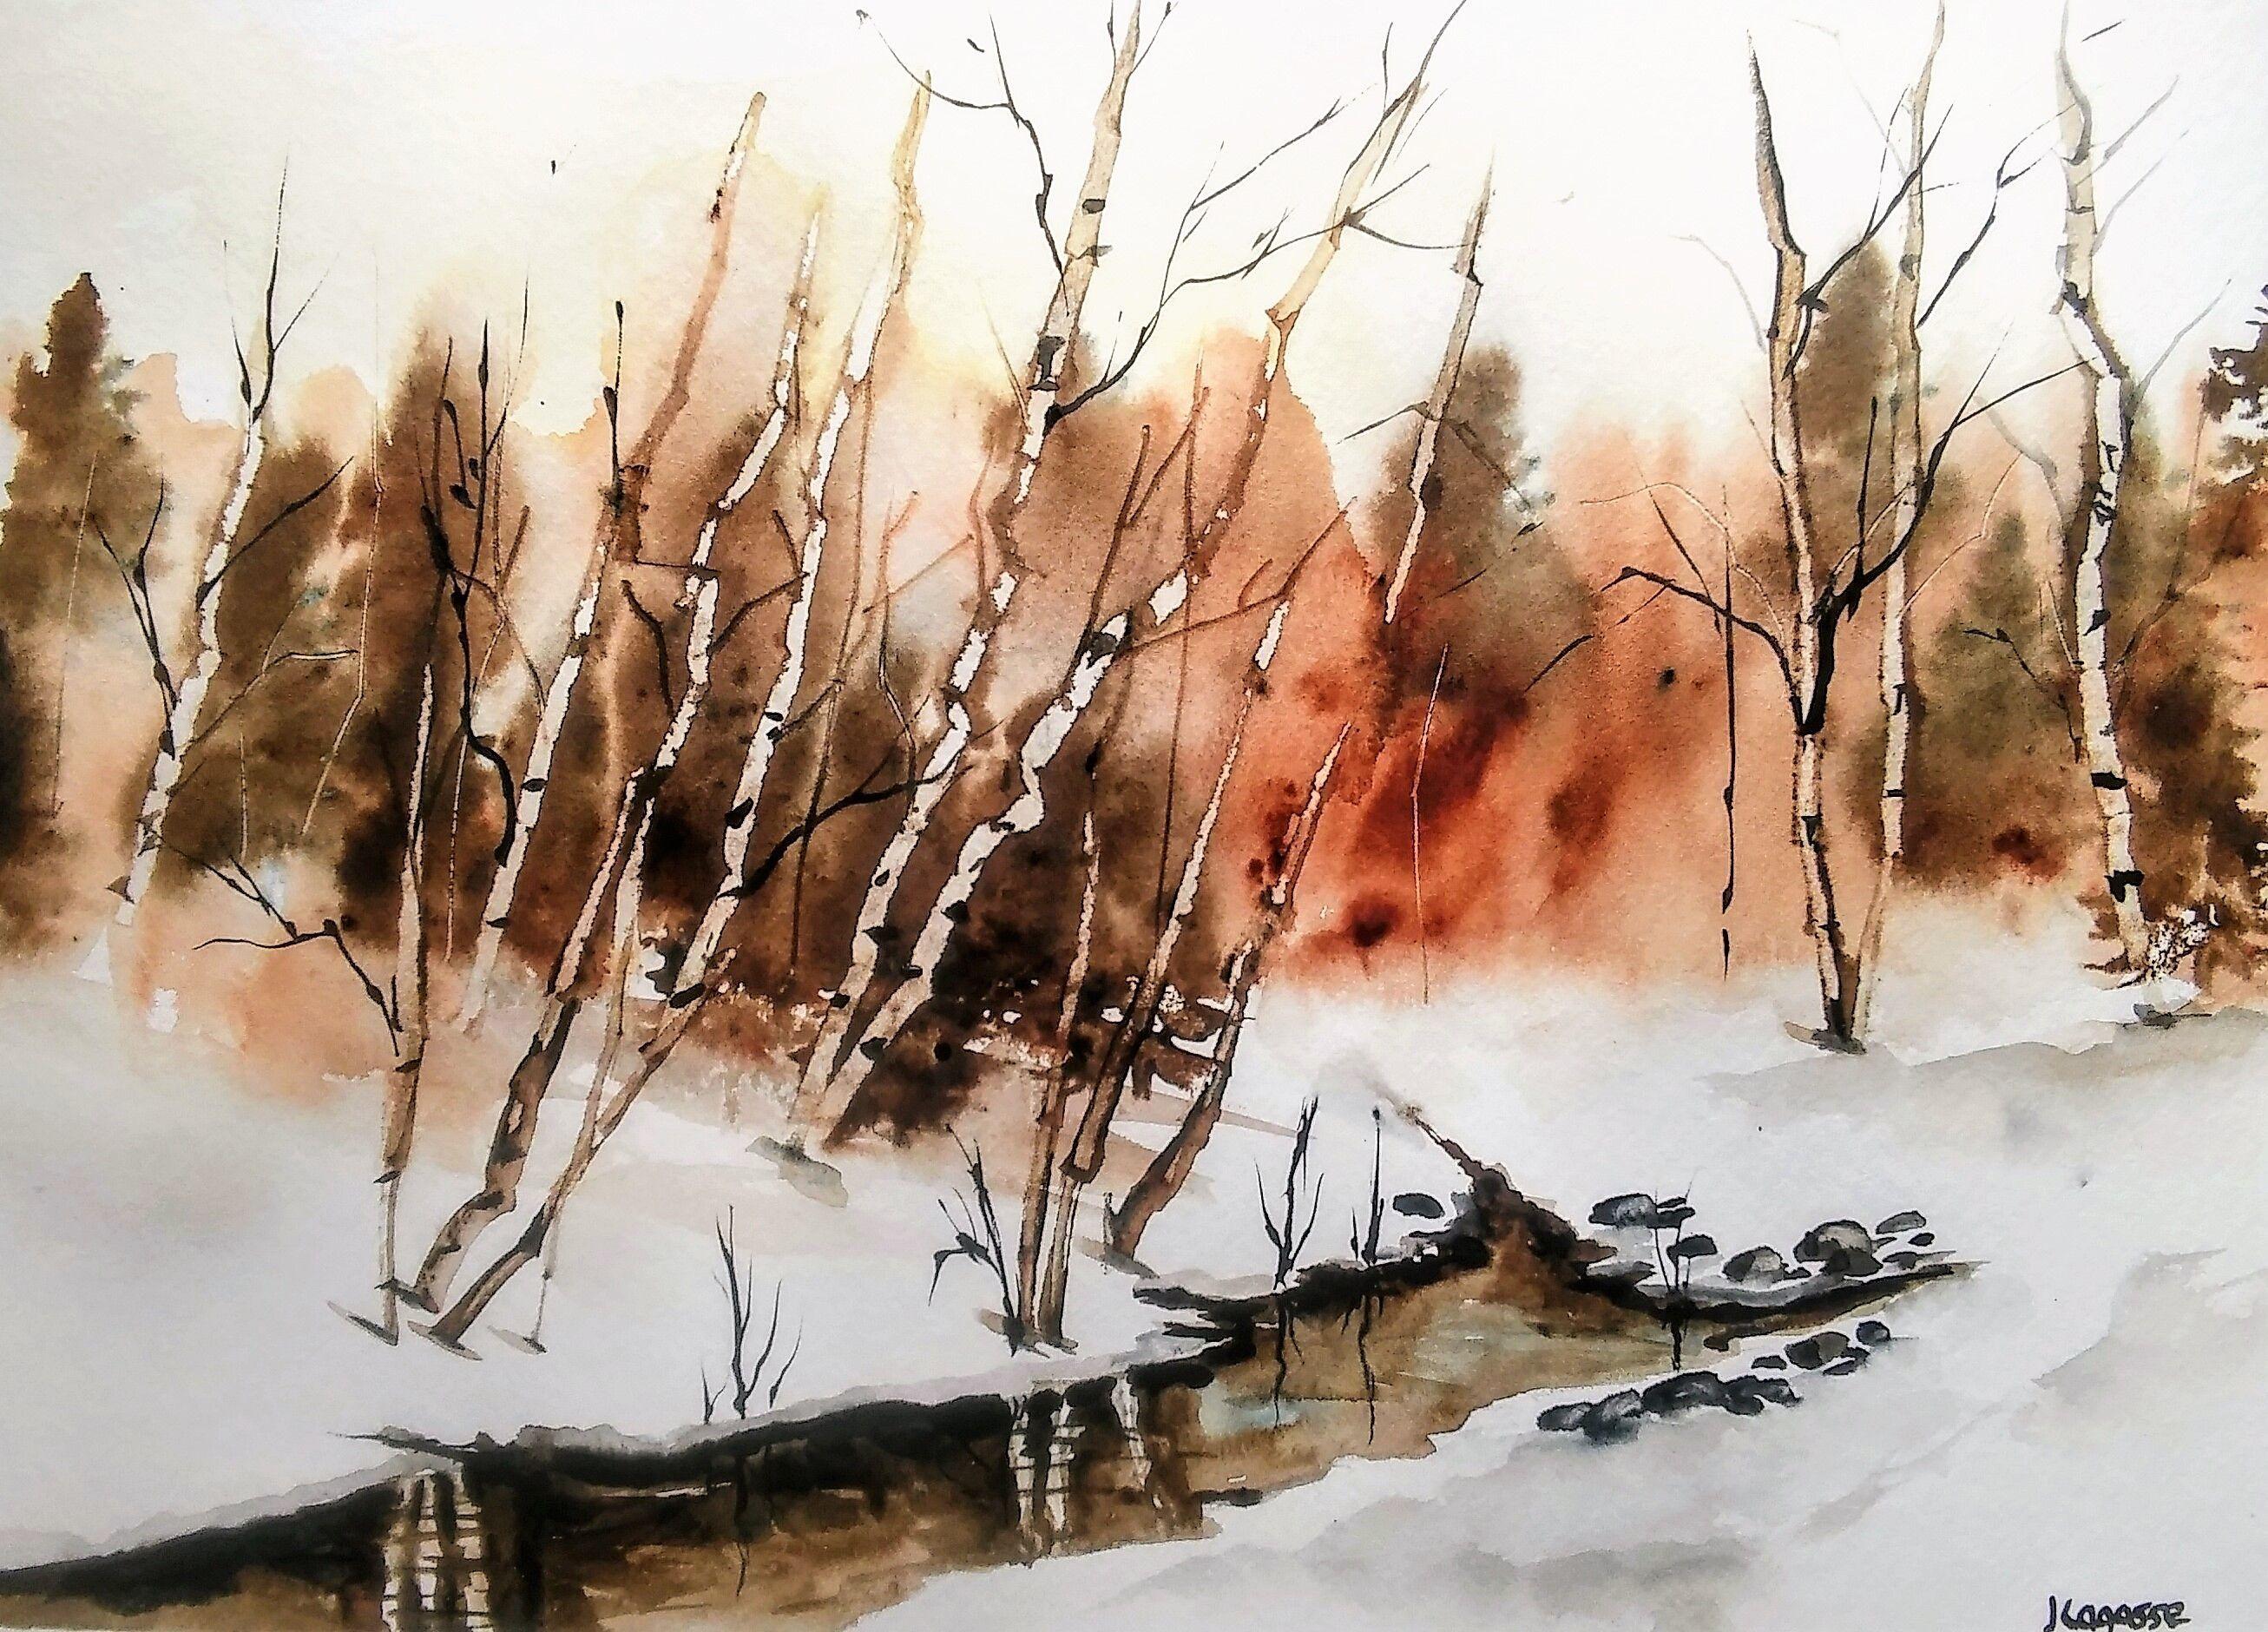 Copper Head Creek Painting Watercolor Landscape Paintings